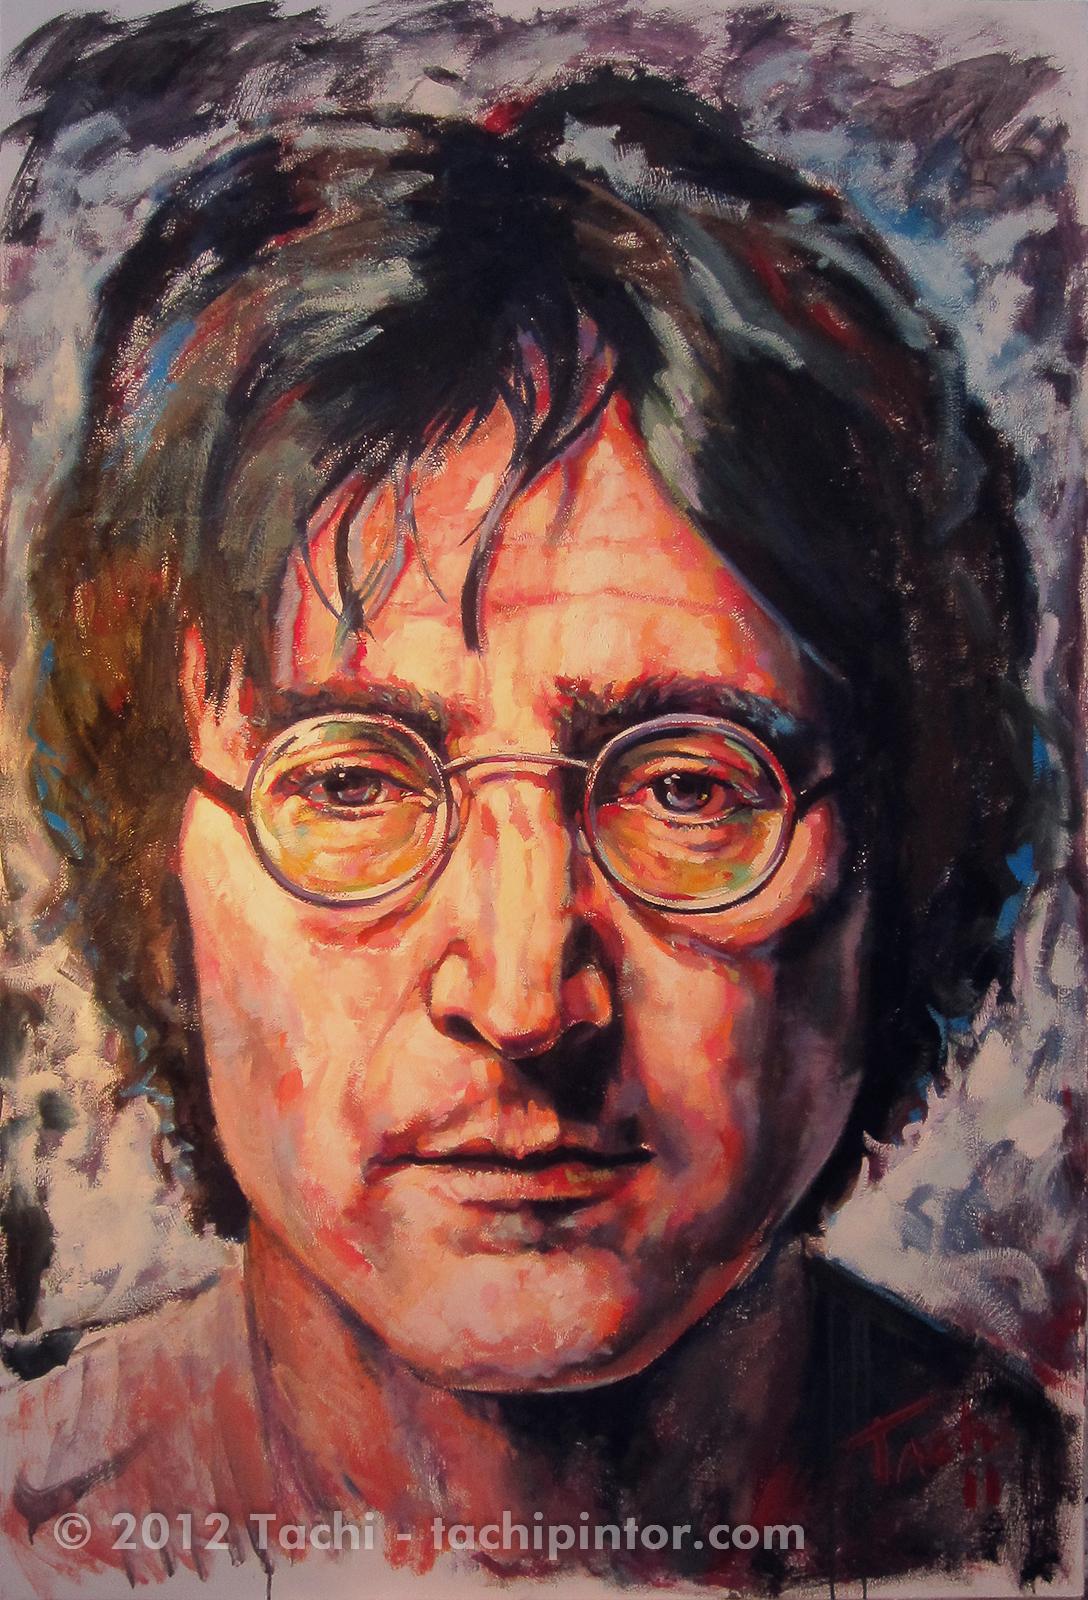 John Lennon by Tachi - © www.tachipintor.com